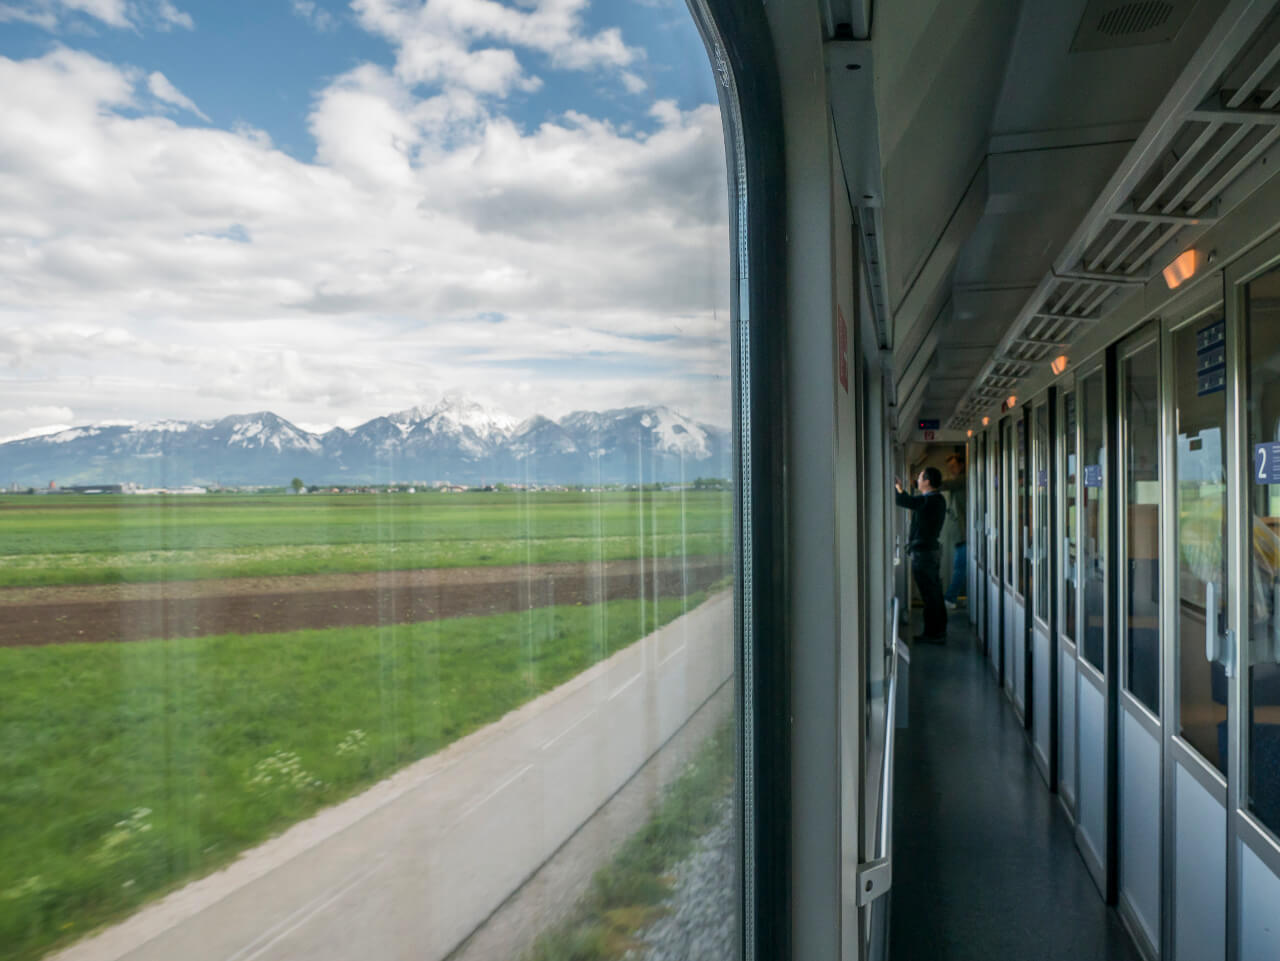 Widok z pociągu na trasie Lublana - Skofja Loka